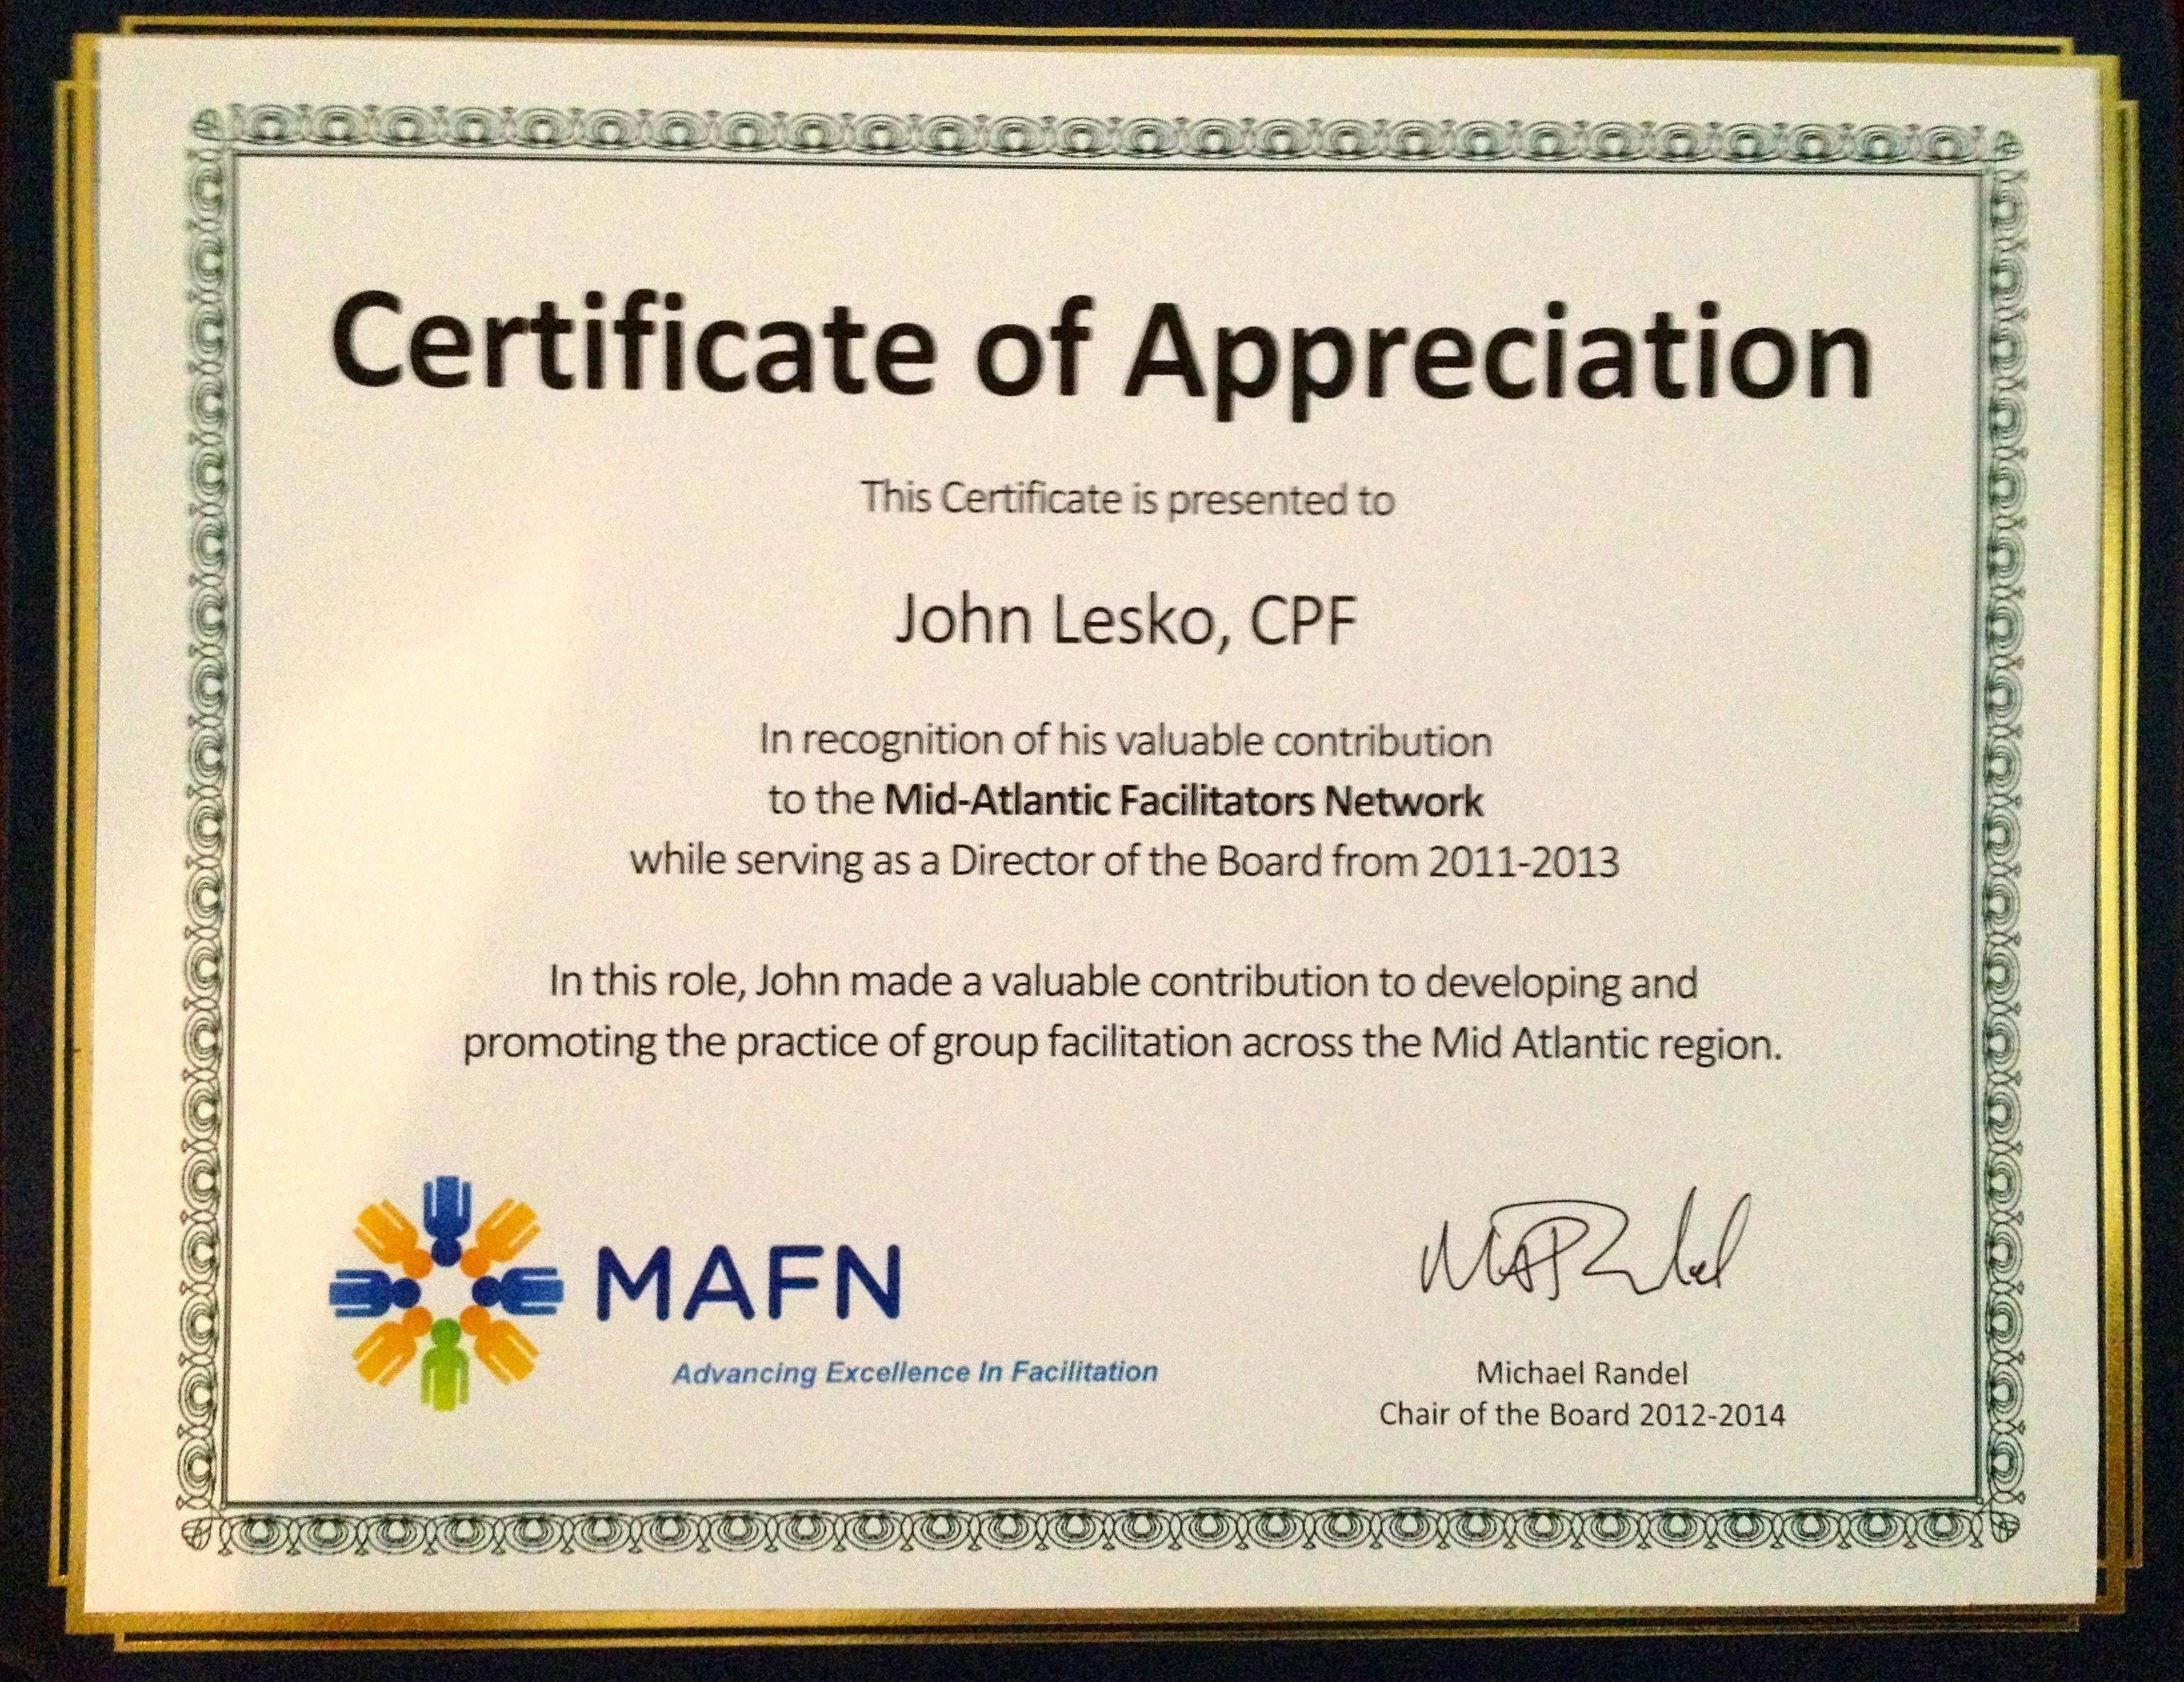 Certificate Of Appreciation Wording Fresh Sample Certificate Appreciation for Facilitator